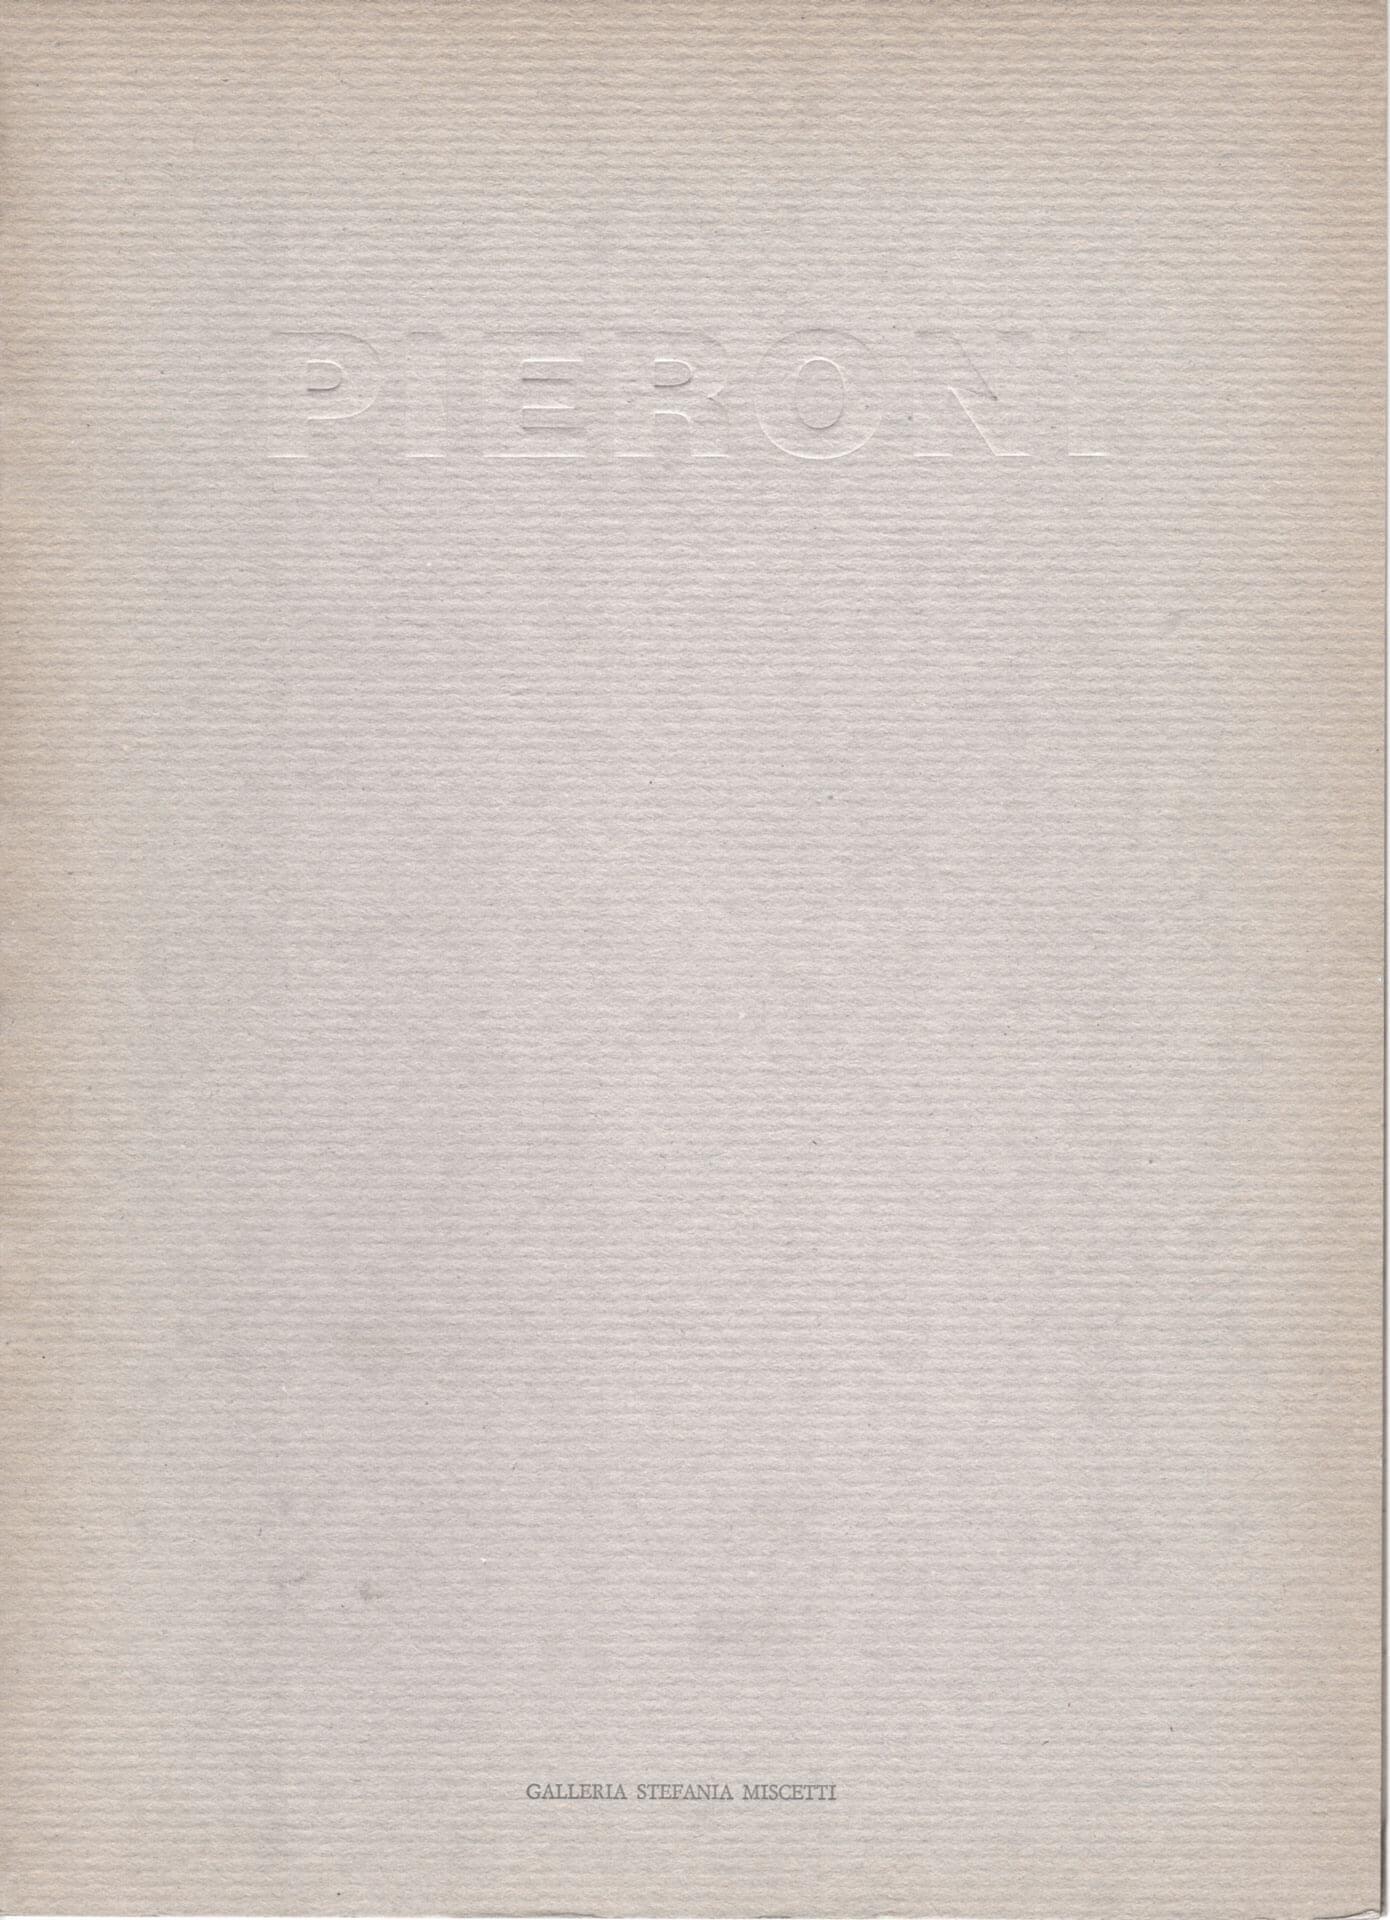 Studio Stefania Miscetti | Catalogues | Claudio Pieroni | Sala macchine